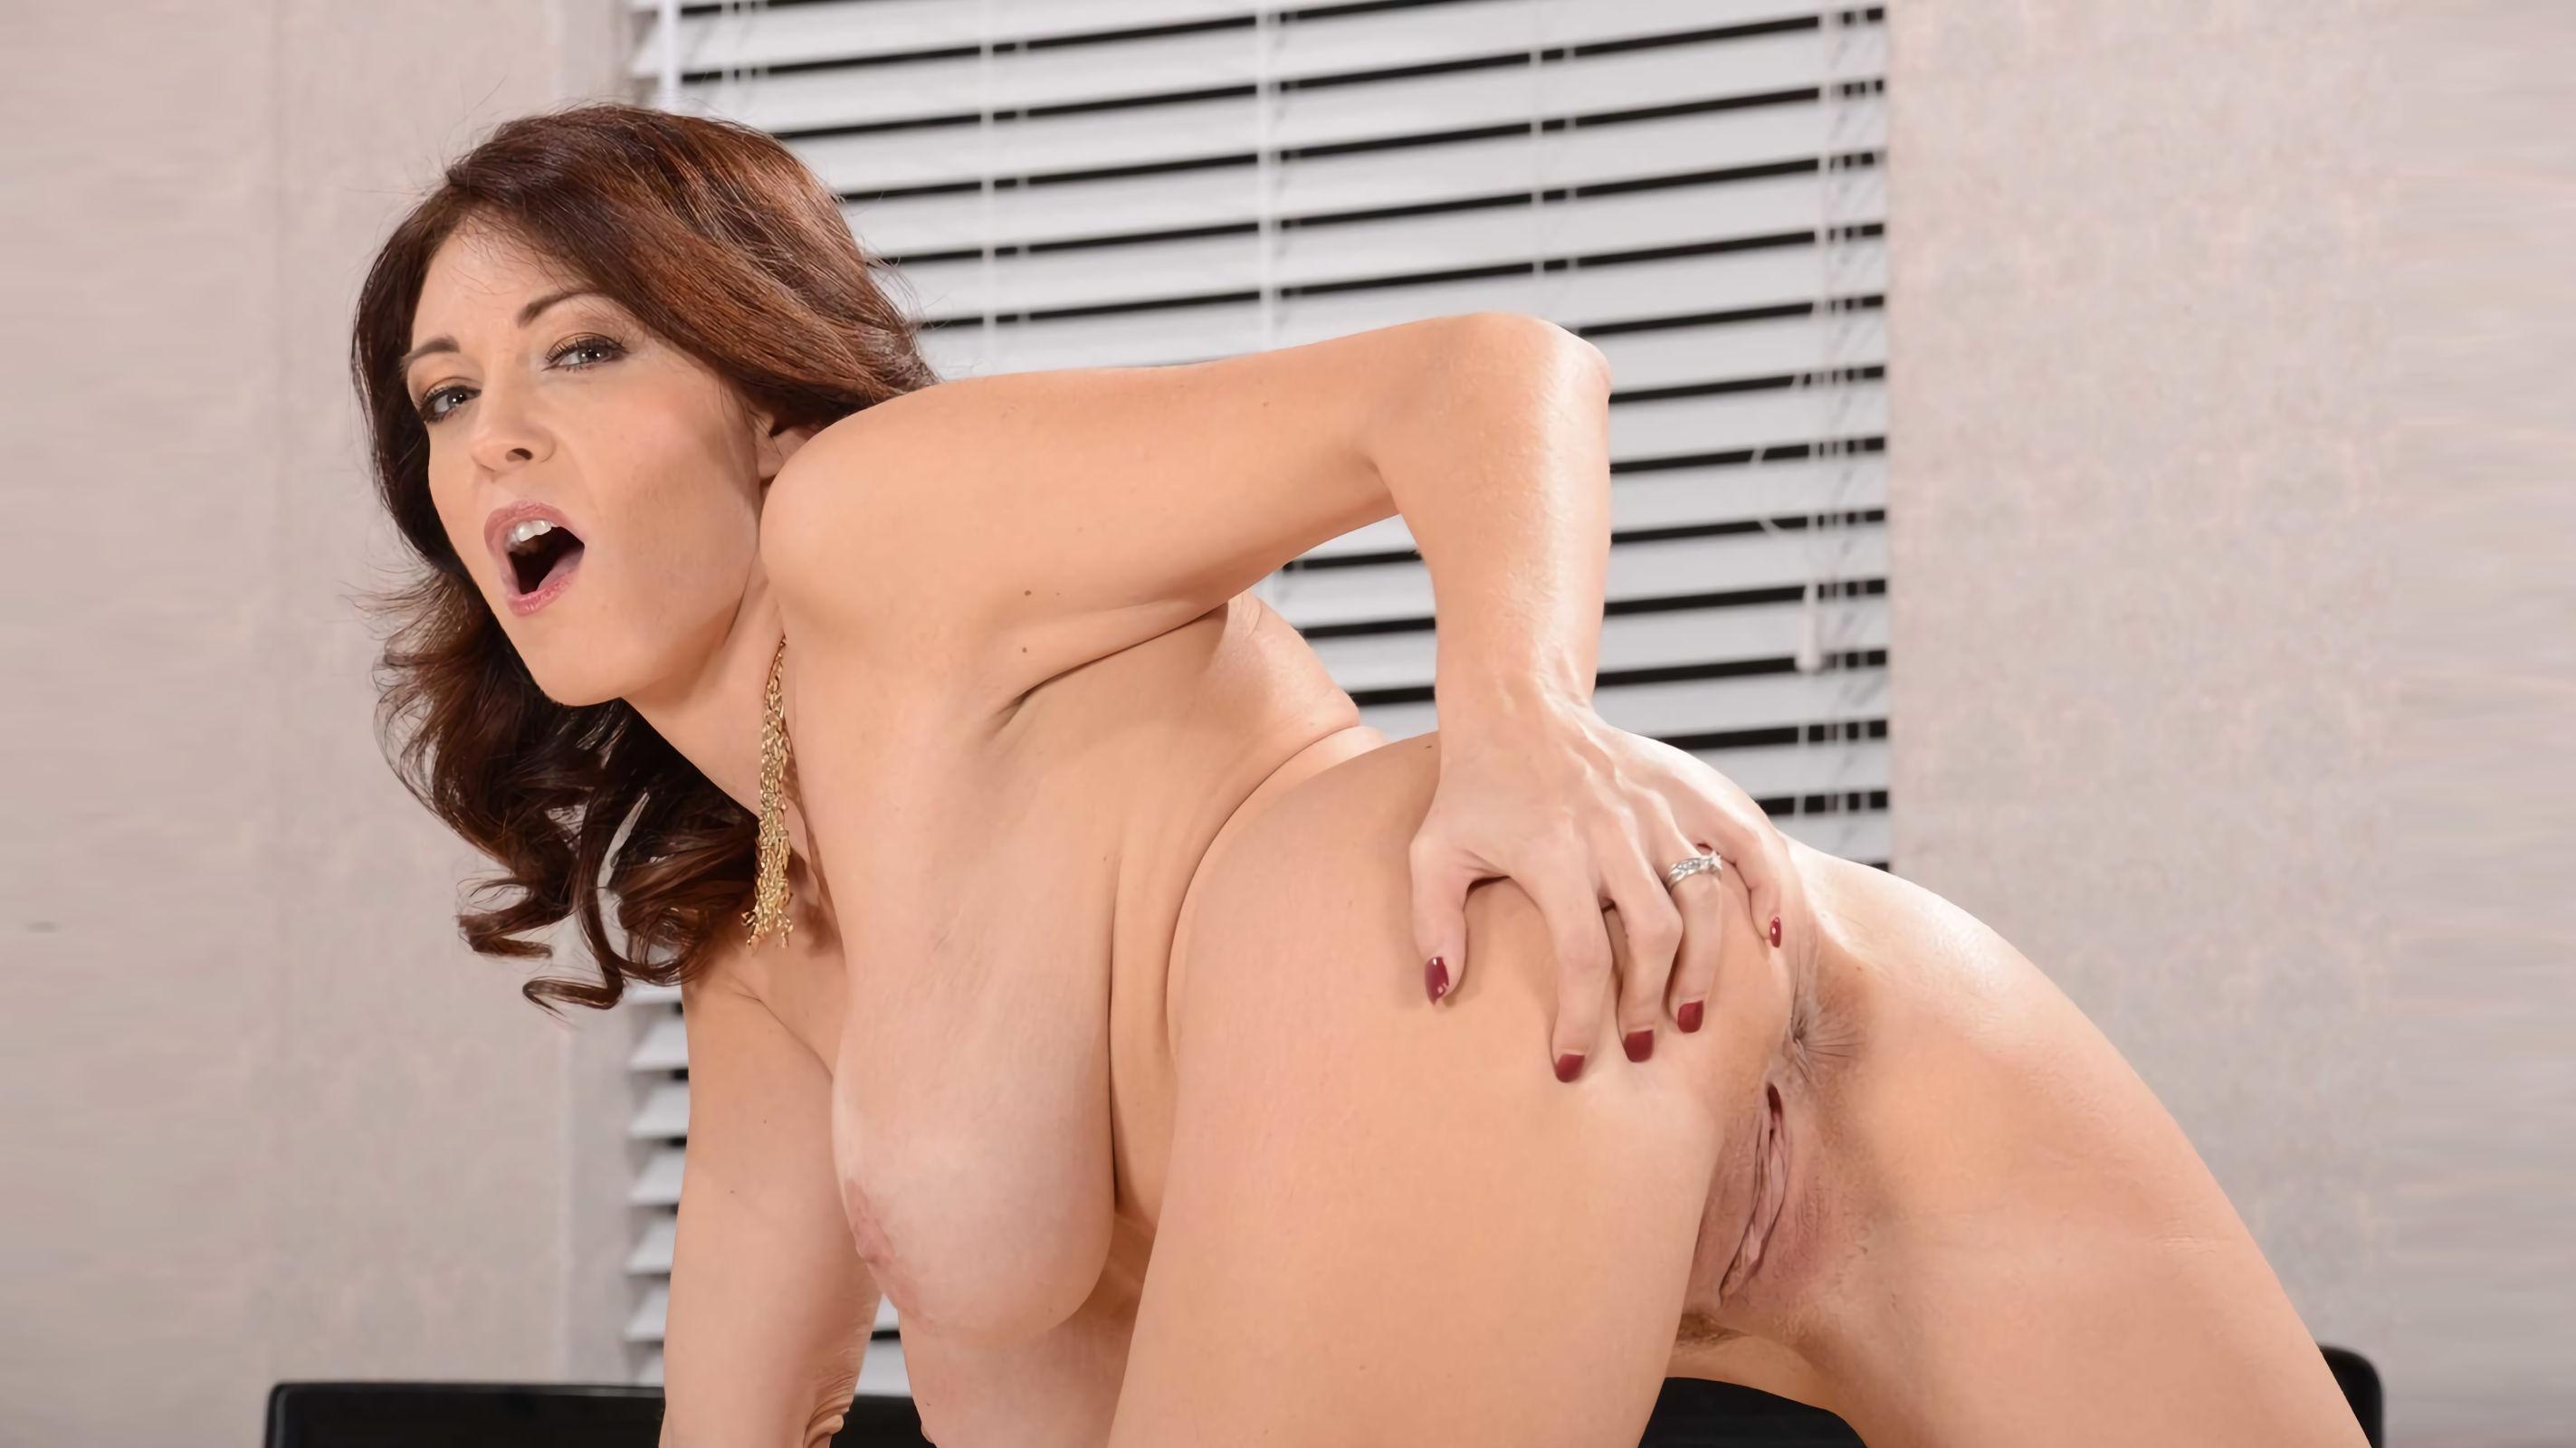 tits ass pussy pics